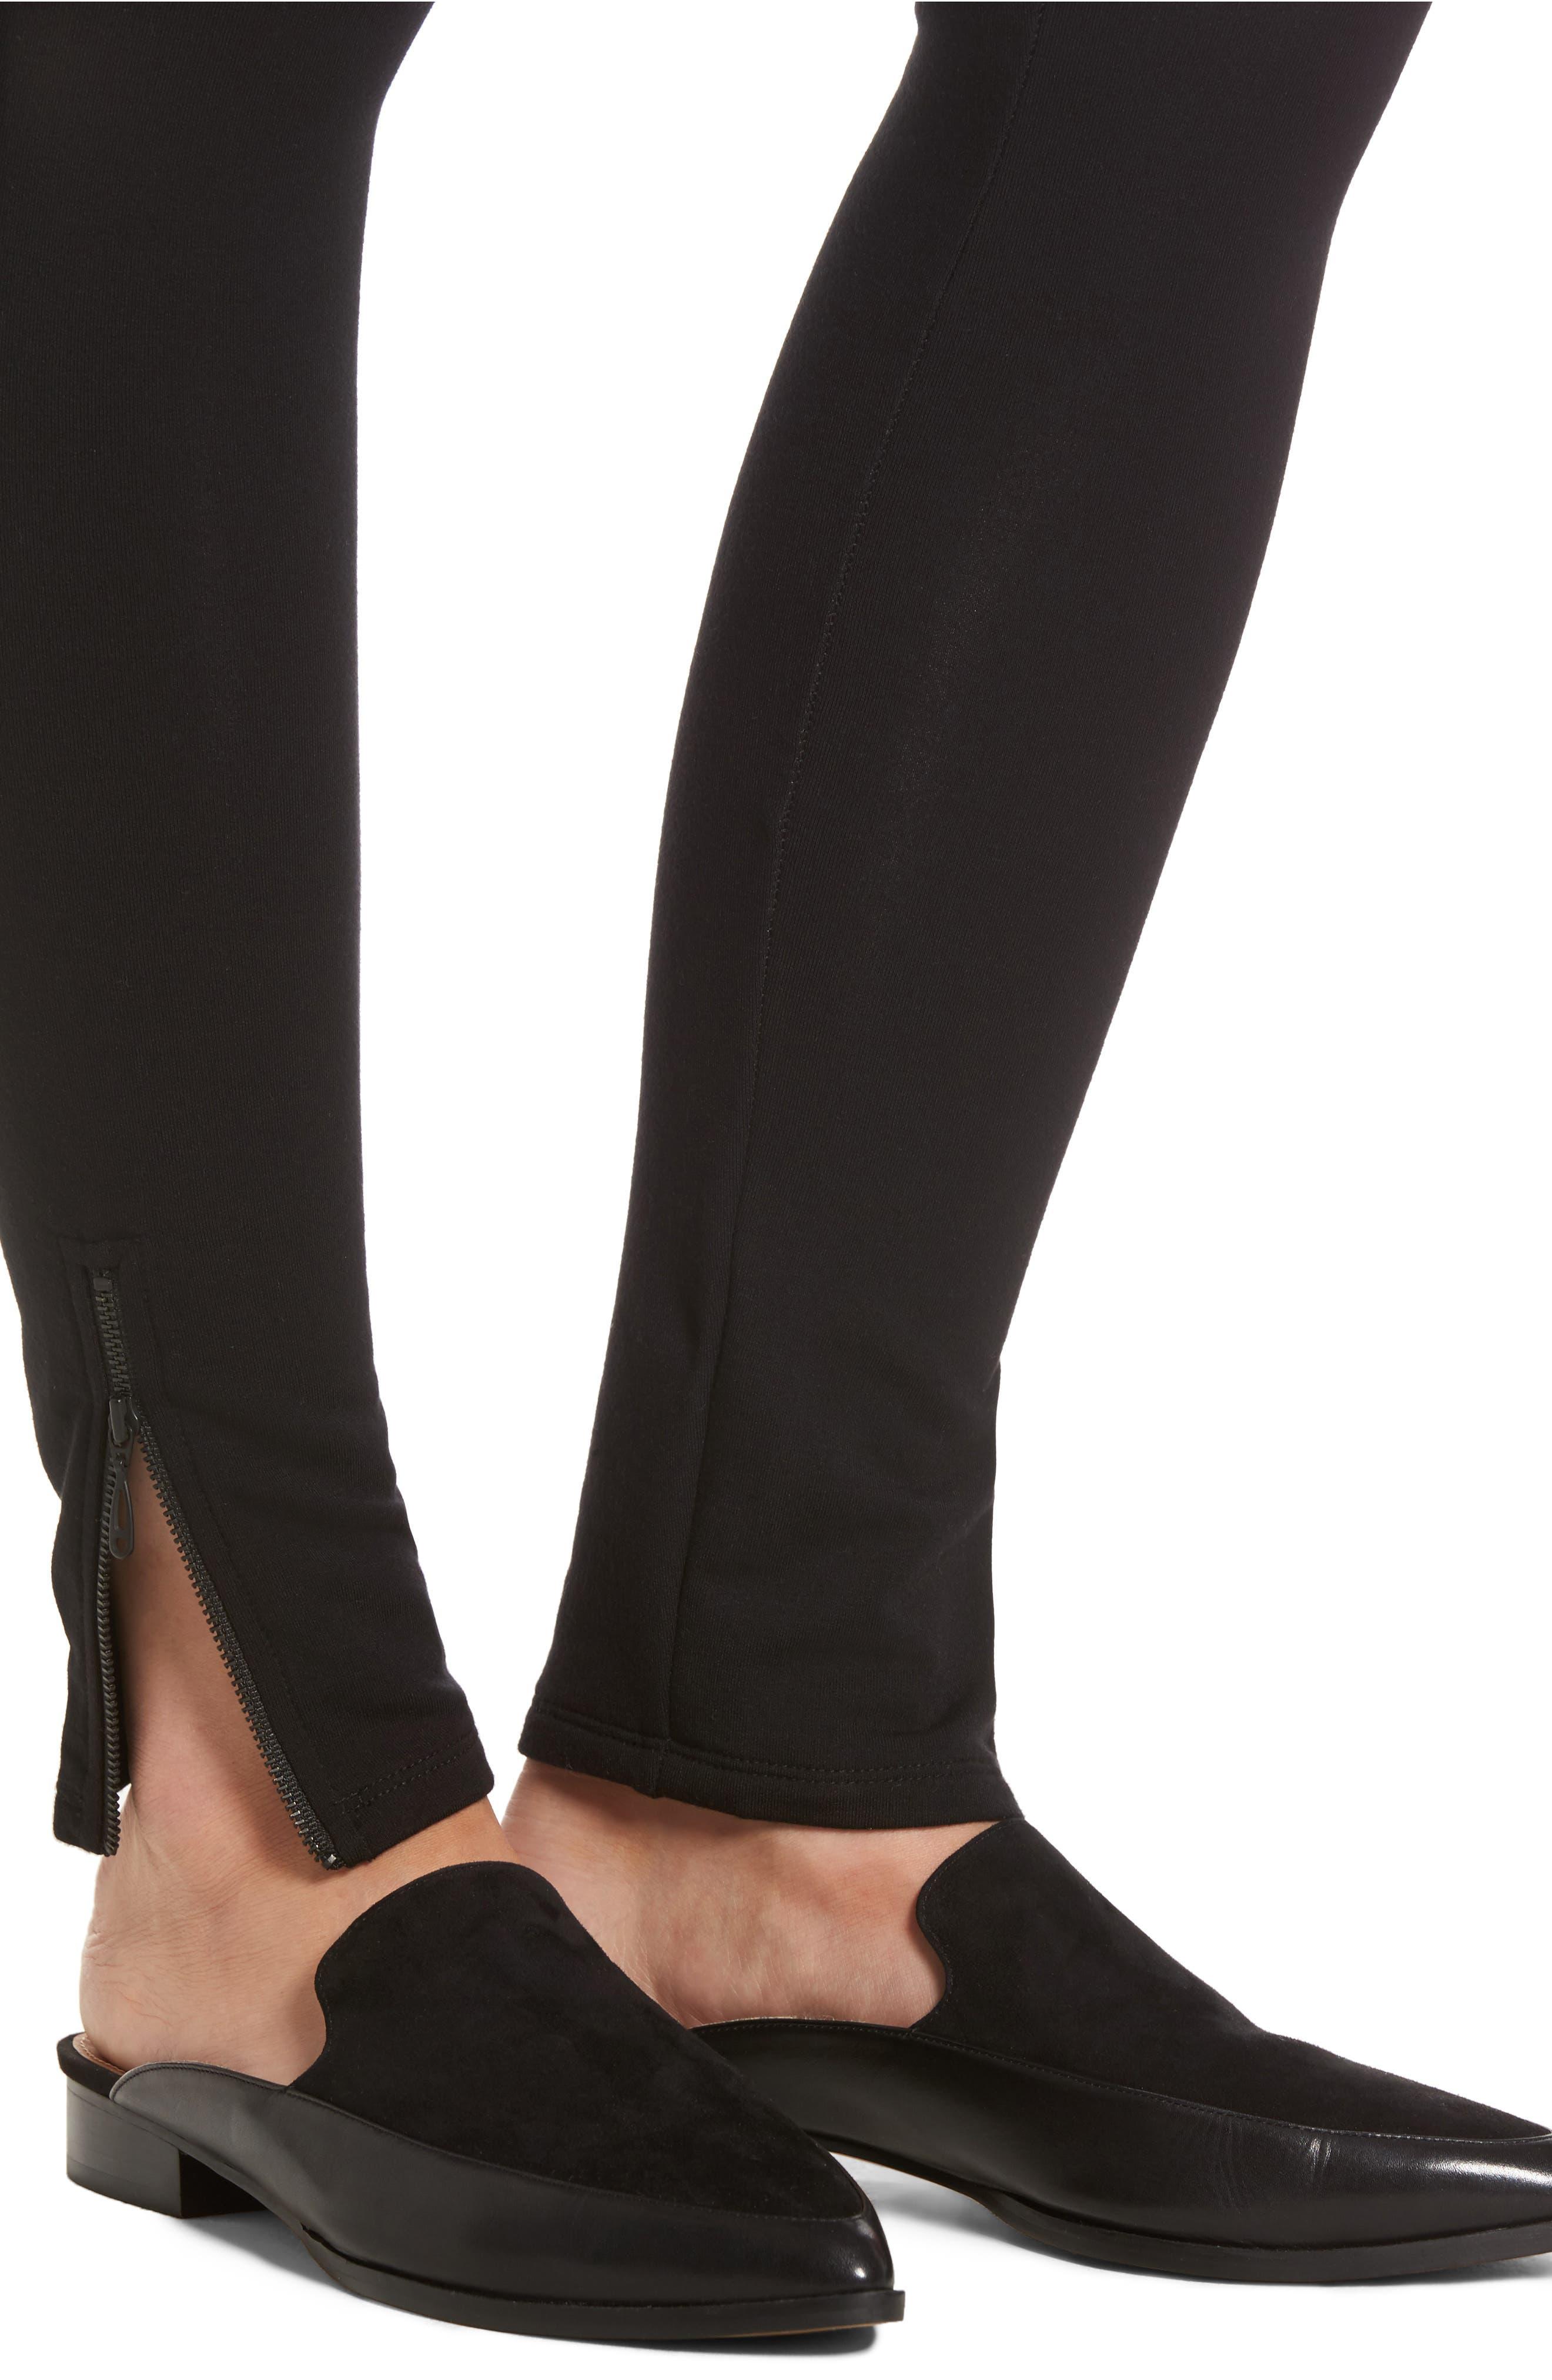 NIC + ZOE Cozy Zipper Leggings,                             Alternate thumbnail 4, color,                             004